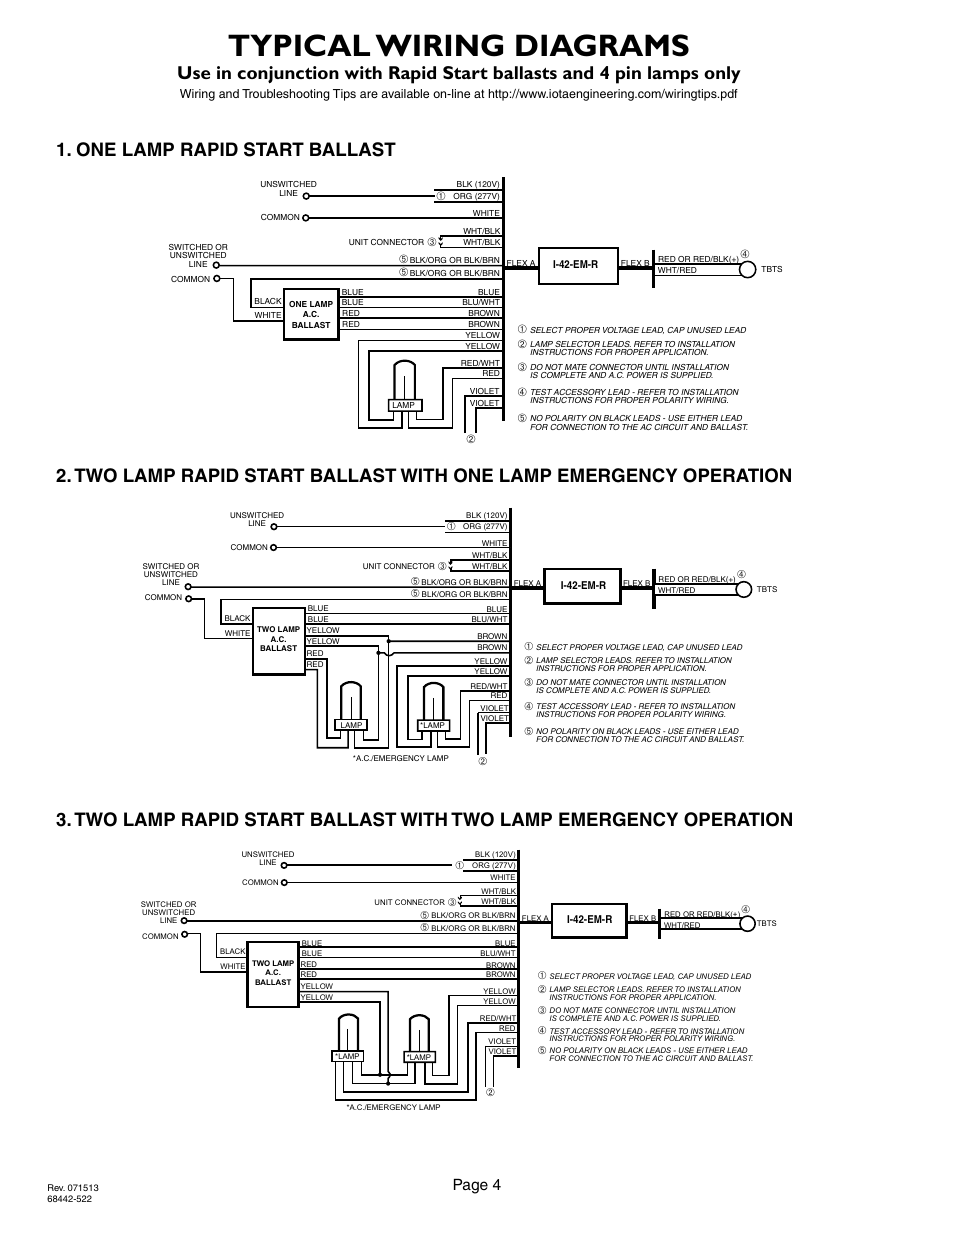 Iota 320 Wiring Diagram